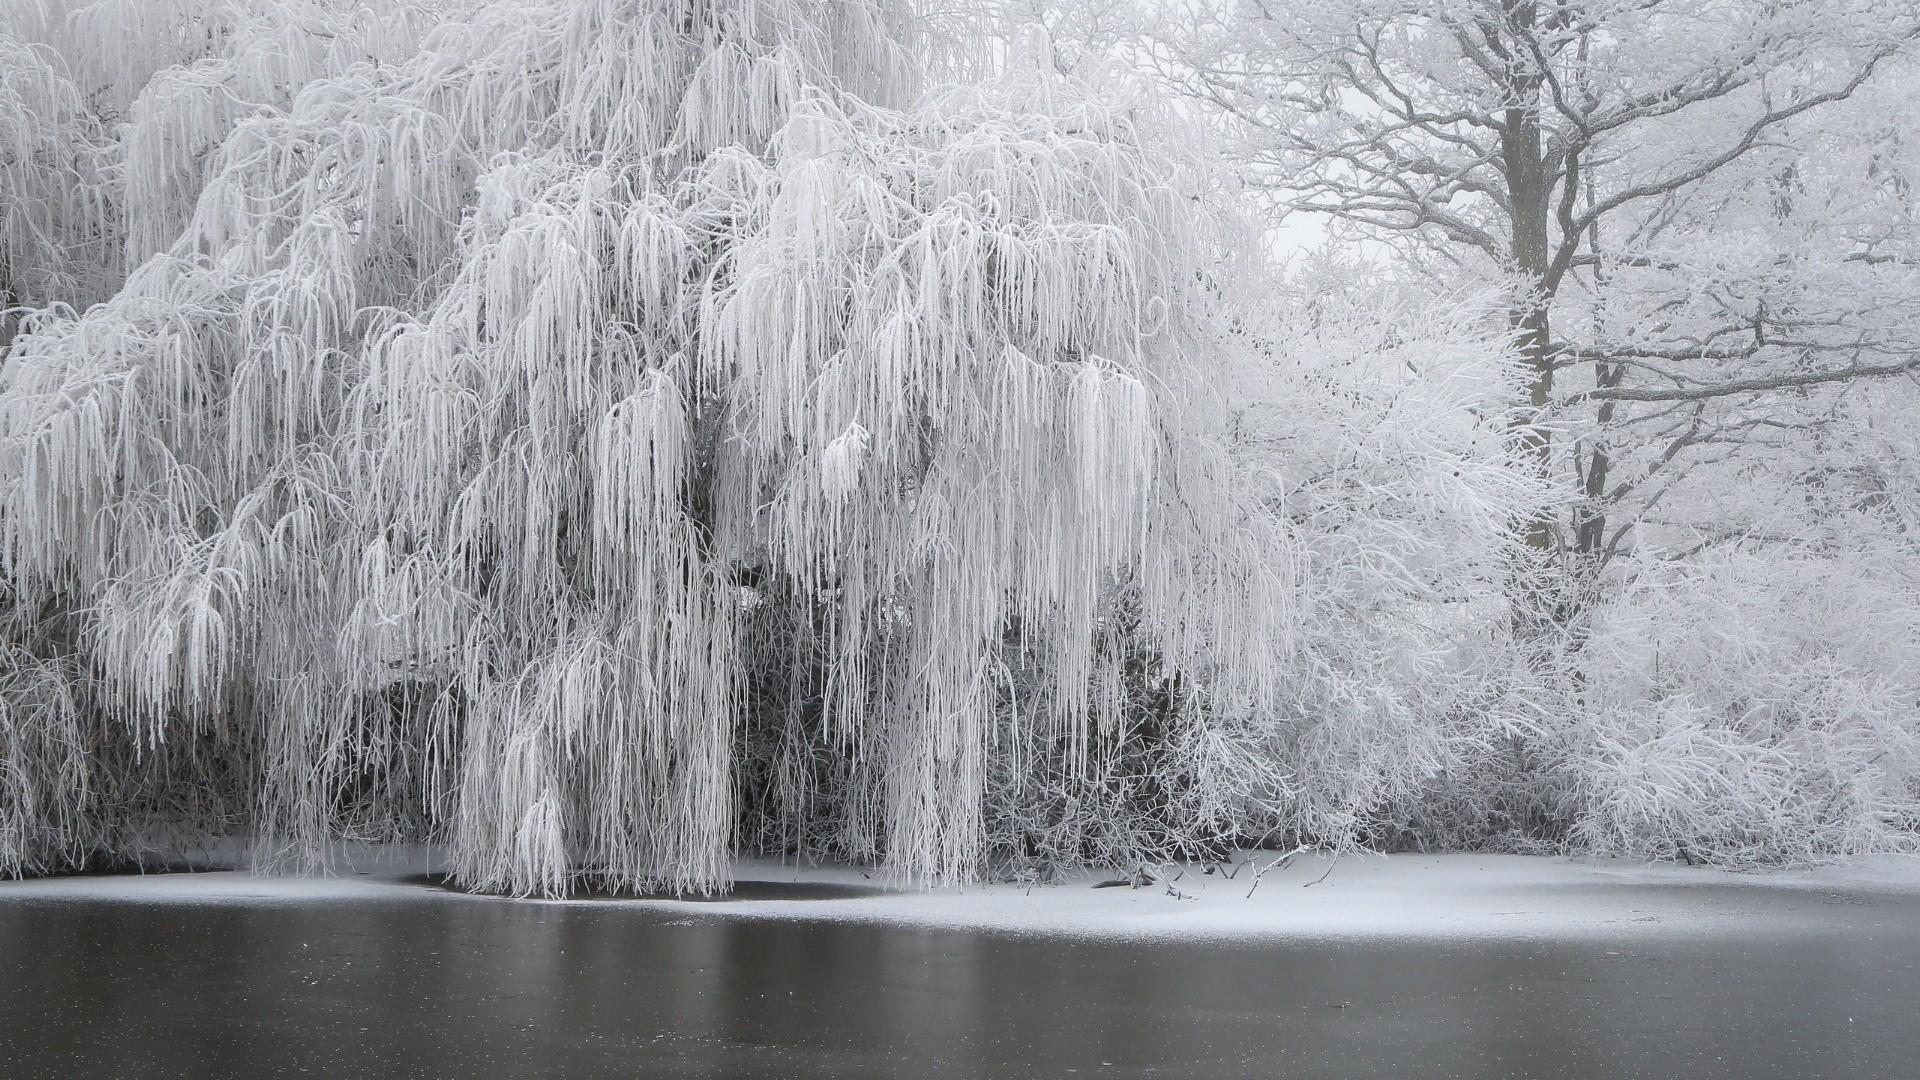 Wallpaper Hd Winter Snow Ice